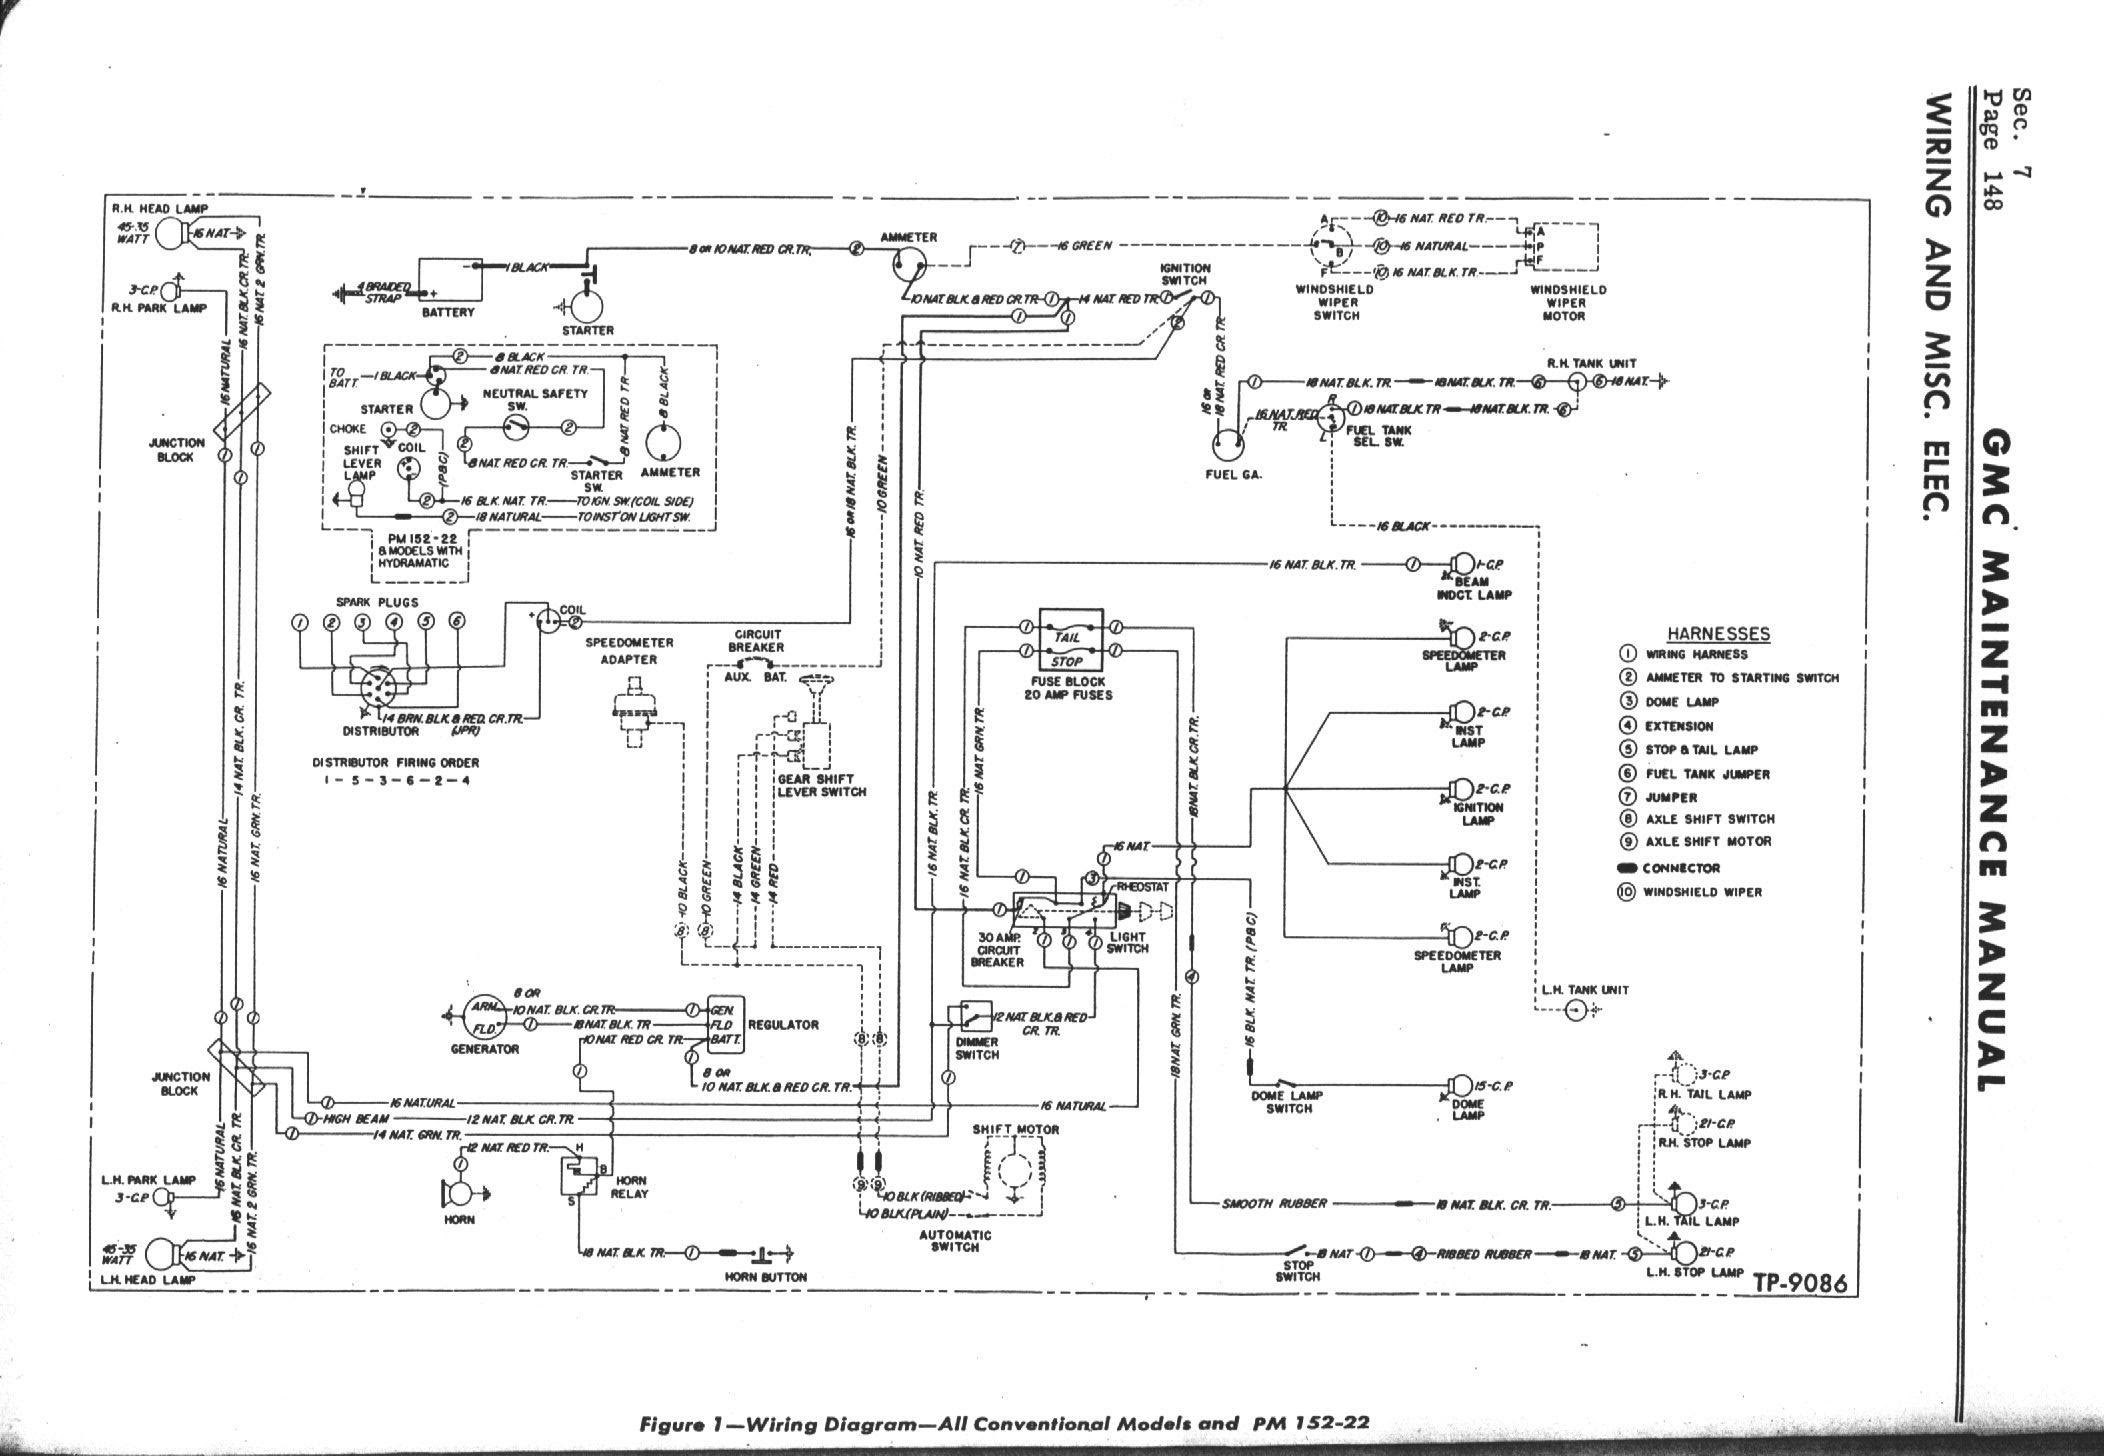 1992 Gmc Topkick Wiring Diagram Schematic Wiring Diagram Productive Productive Zaafran It